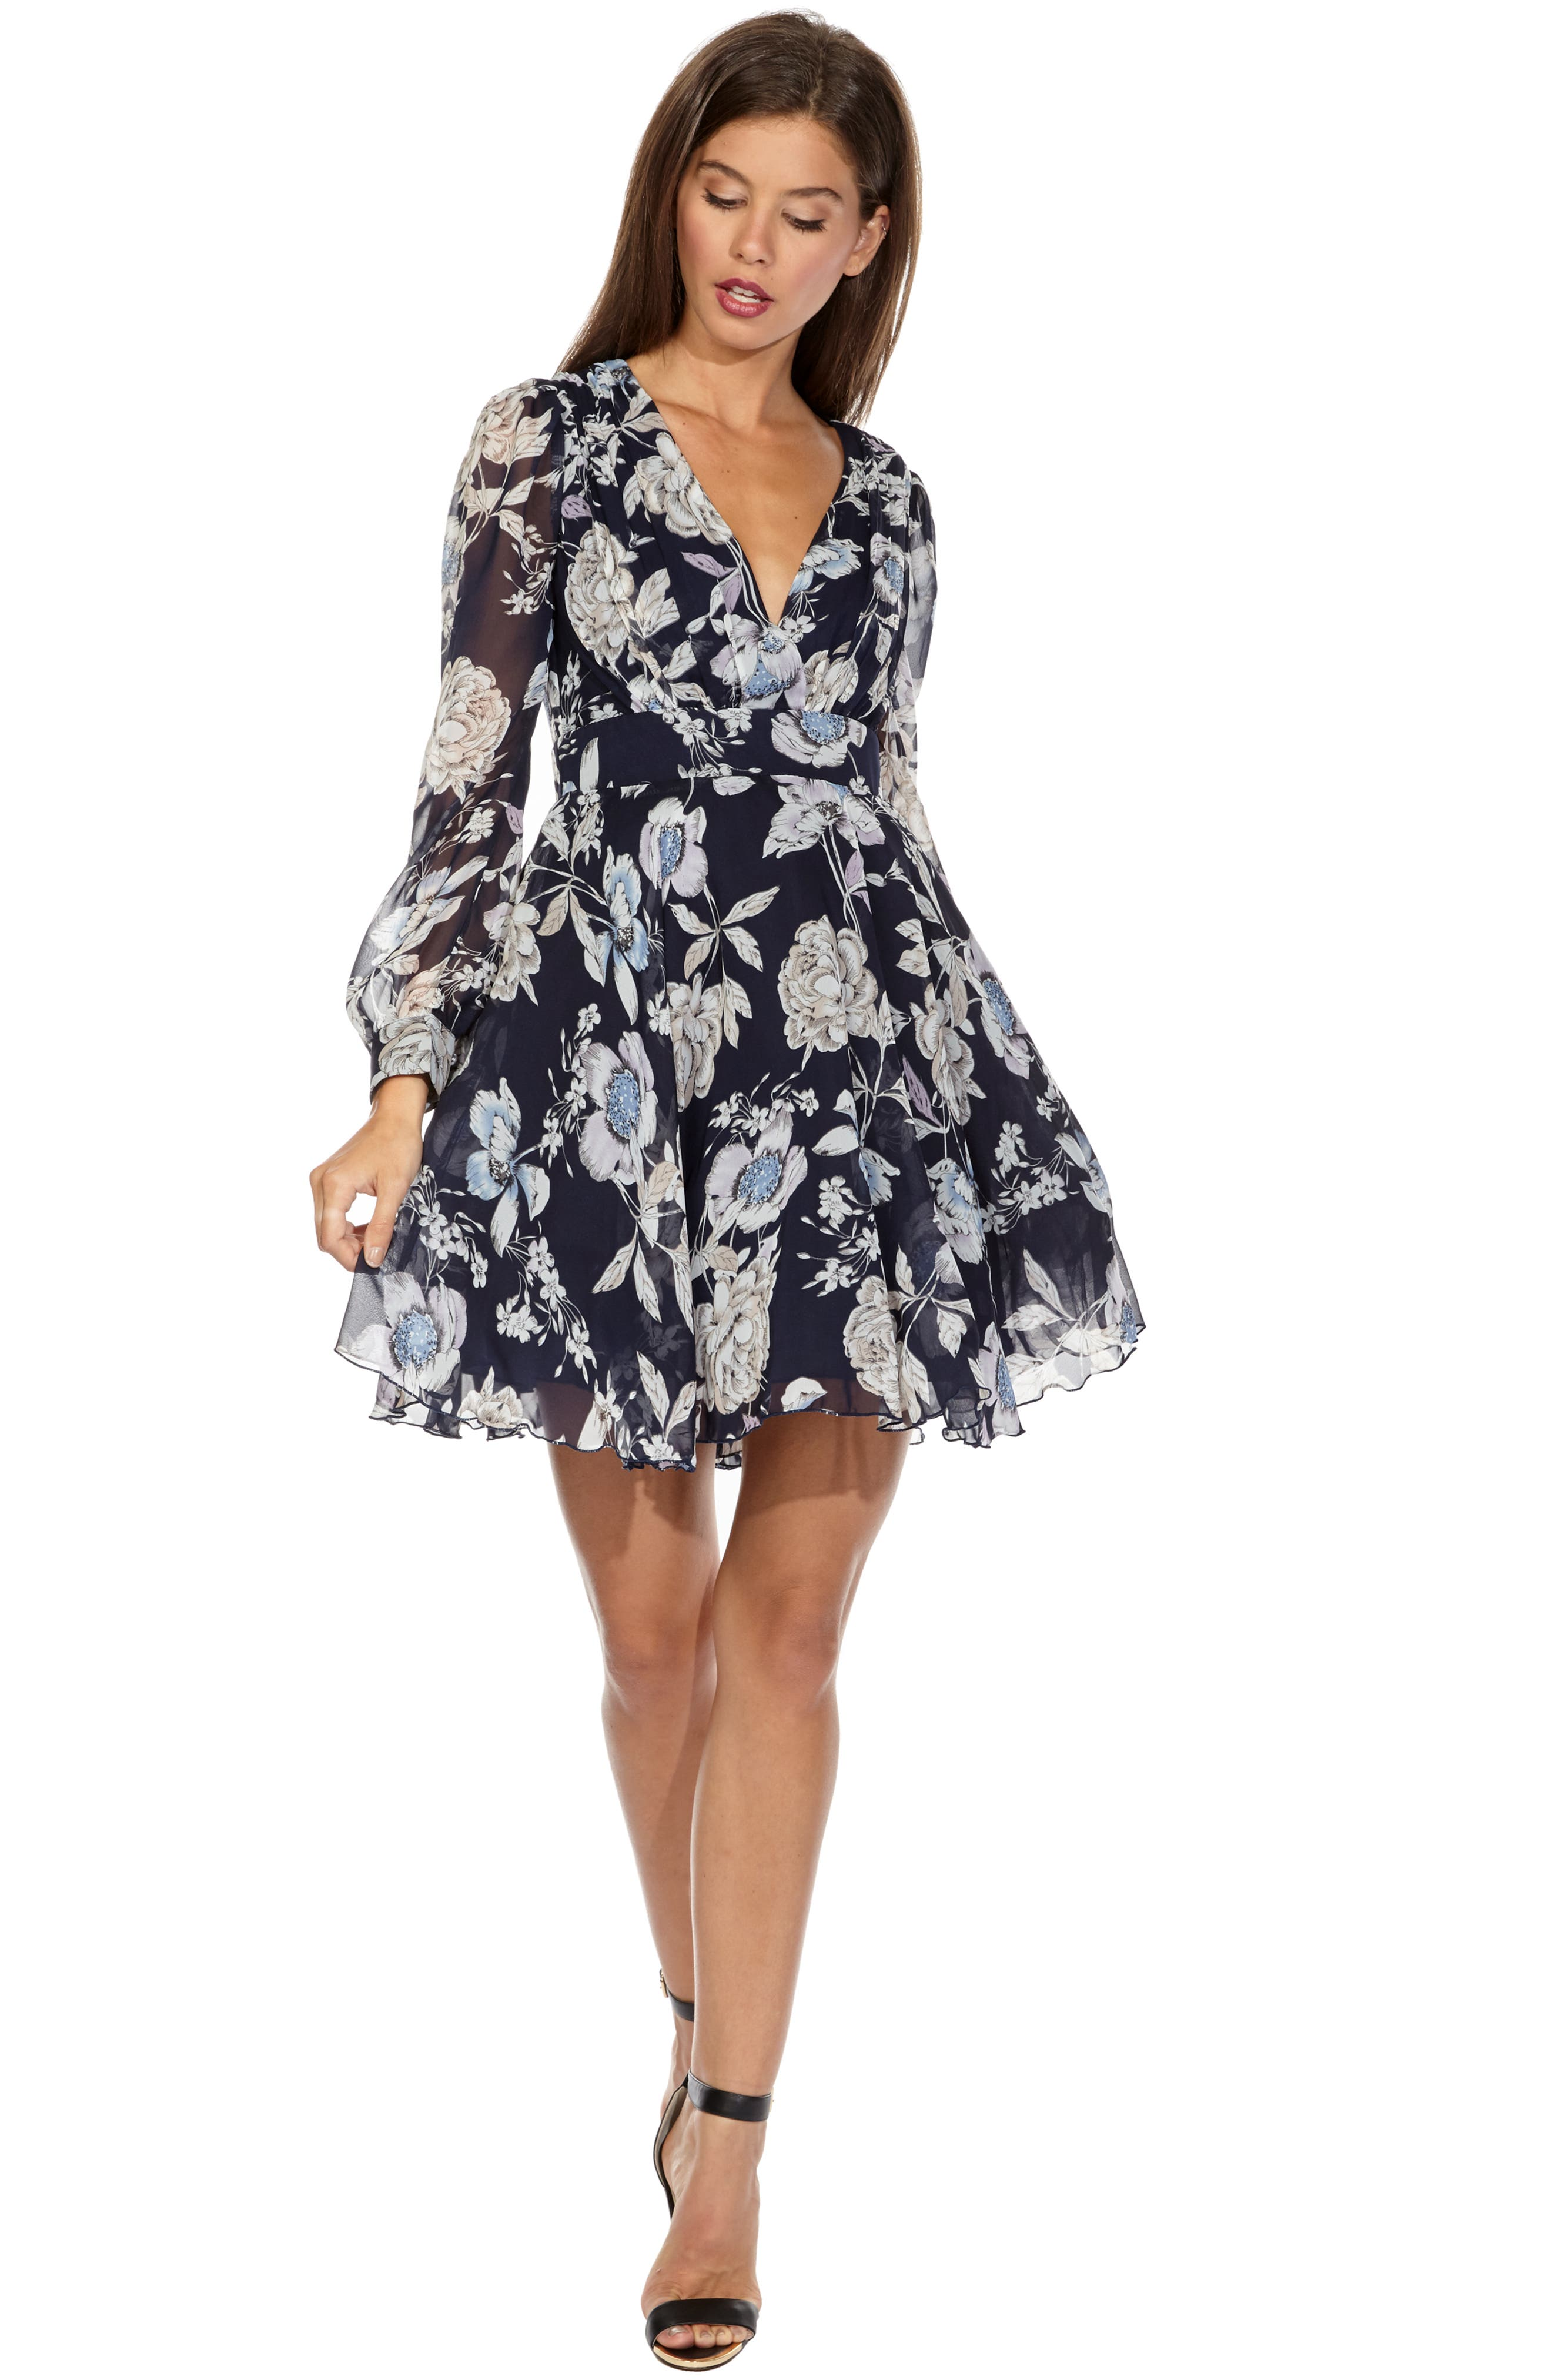 Nordi Floral Fit & Flare Party Dress,                             Alternate thumbnail 3, color,                             FLORAL PRINT